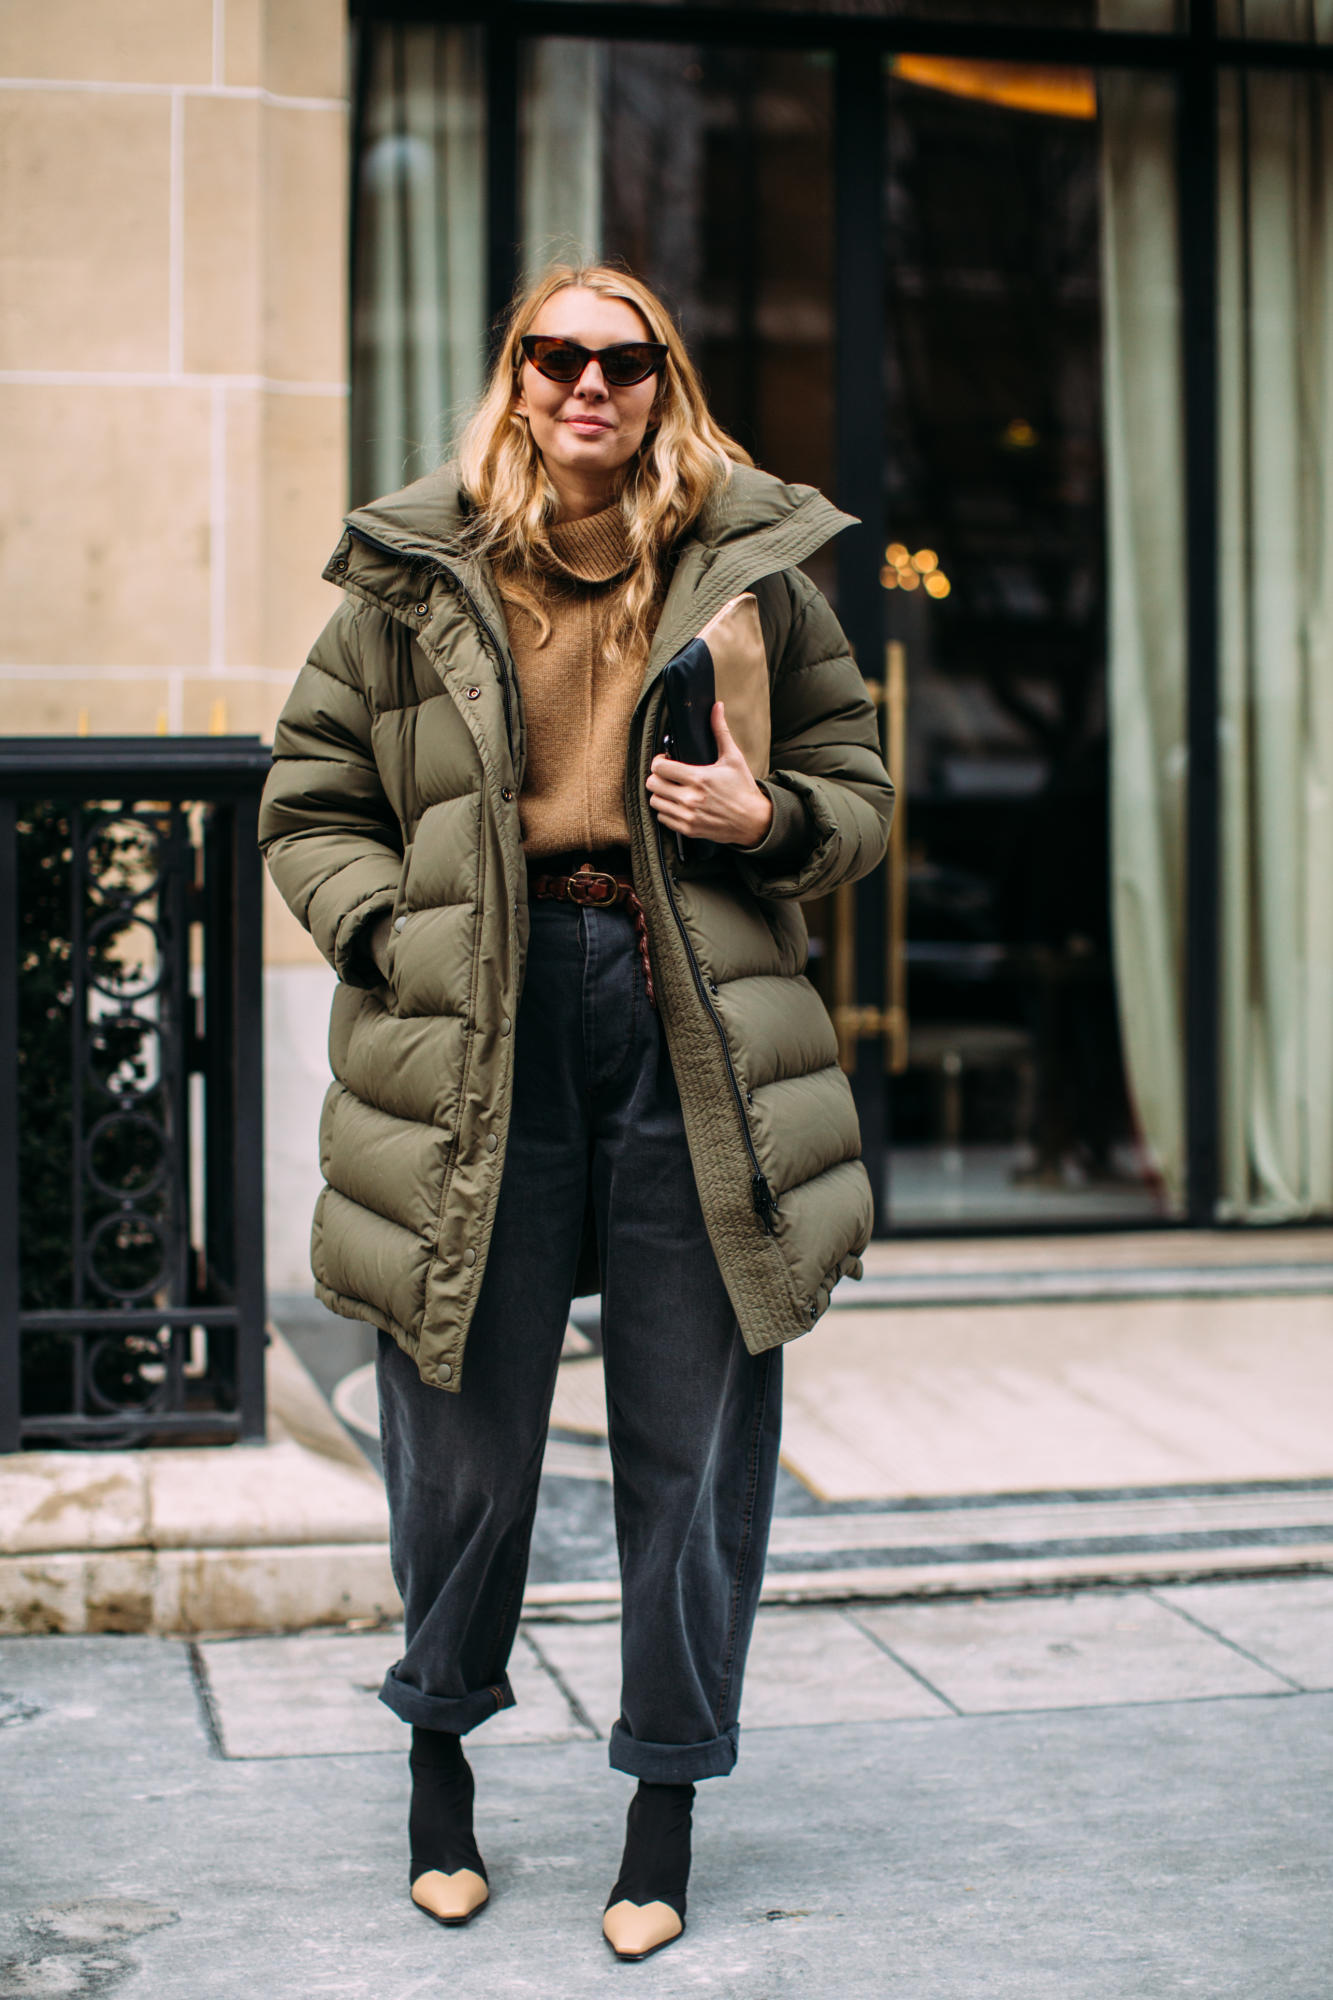 paris-fashion-week-street-style-fall-2018-day-3-52.jpg